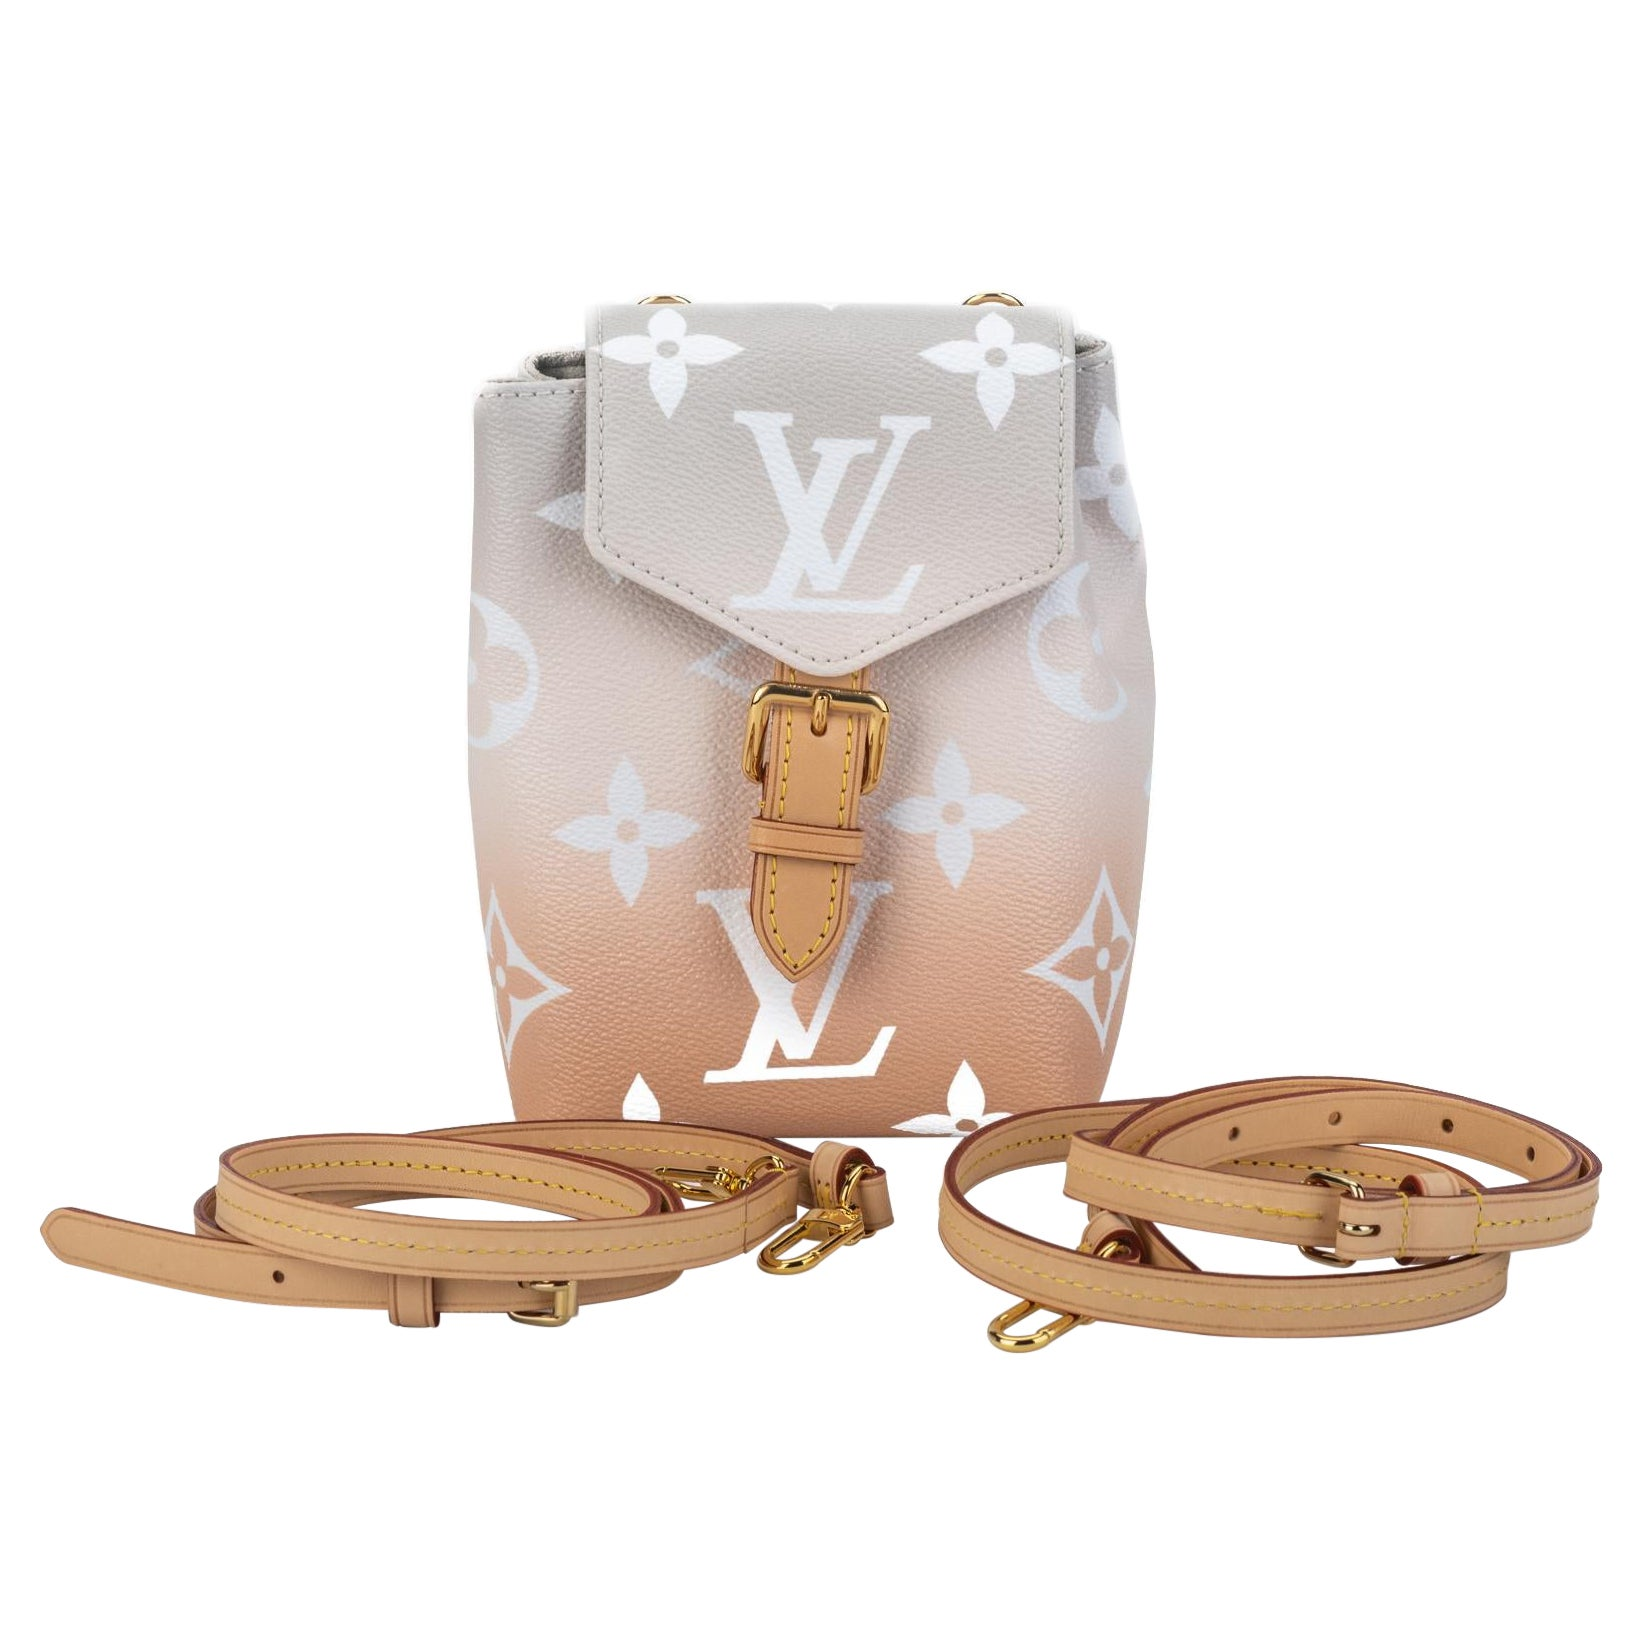 New Louis Vuitton Blush Ombre Backpack Belt Bag